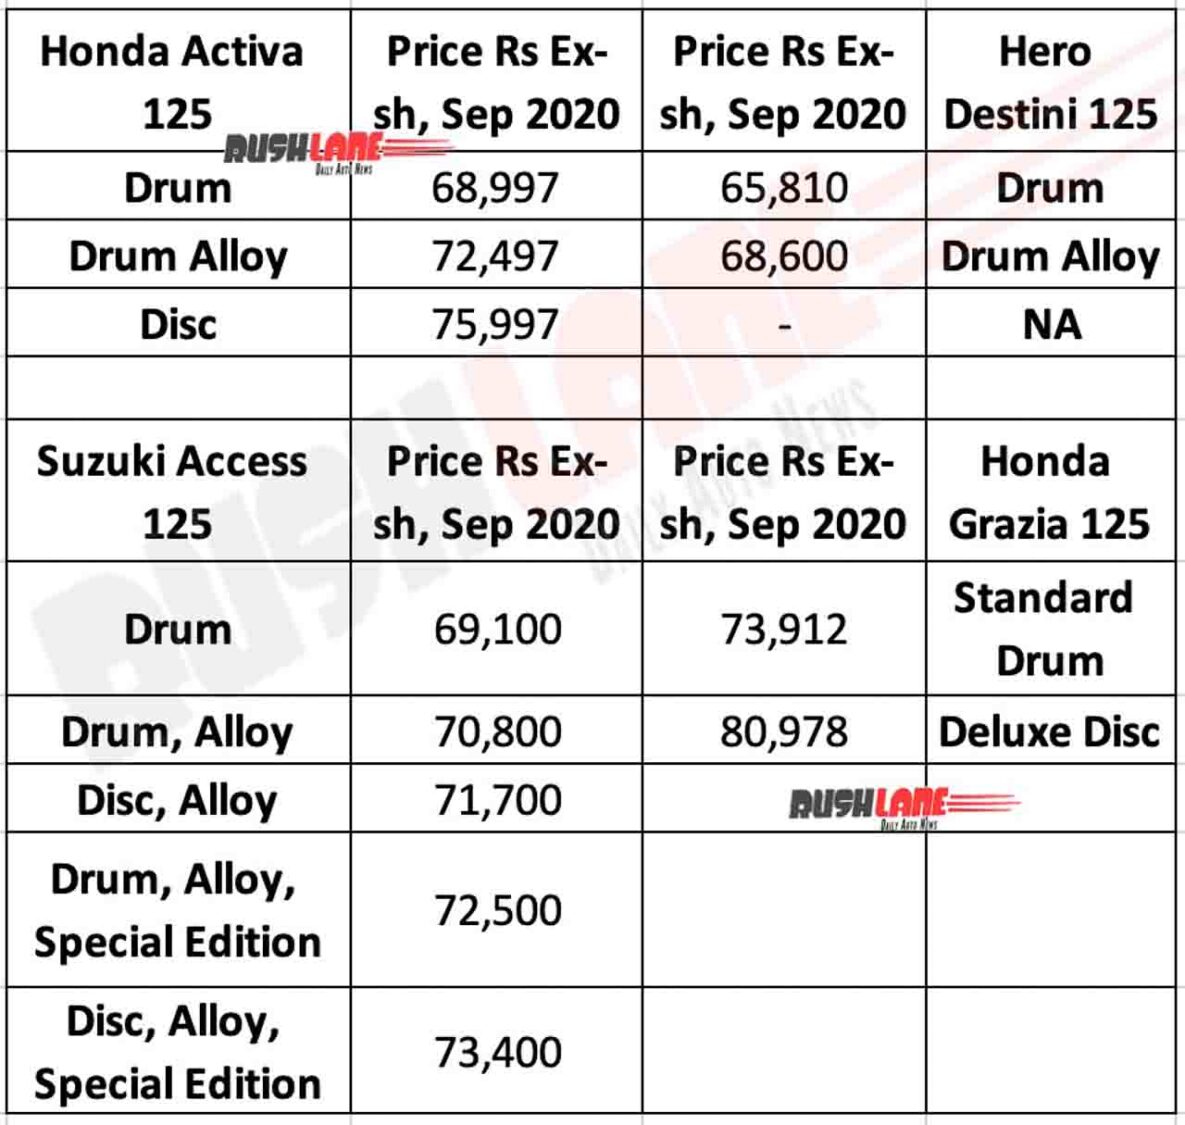 Hero Destini vs Rivals, ex-sh Prices